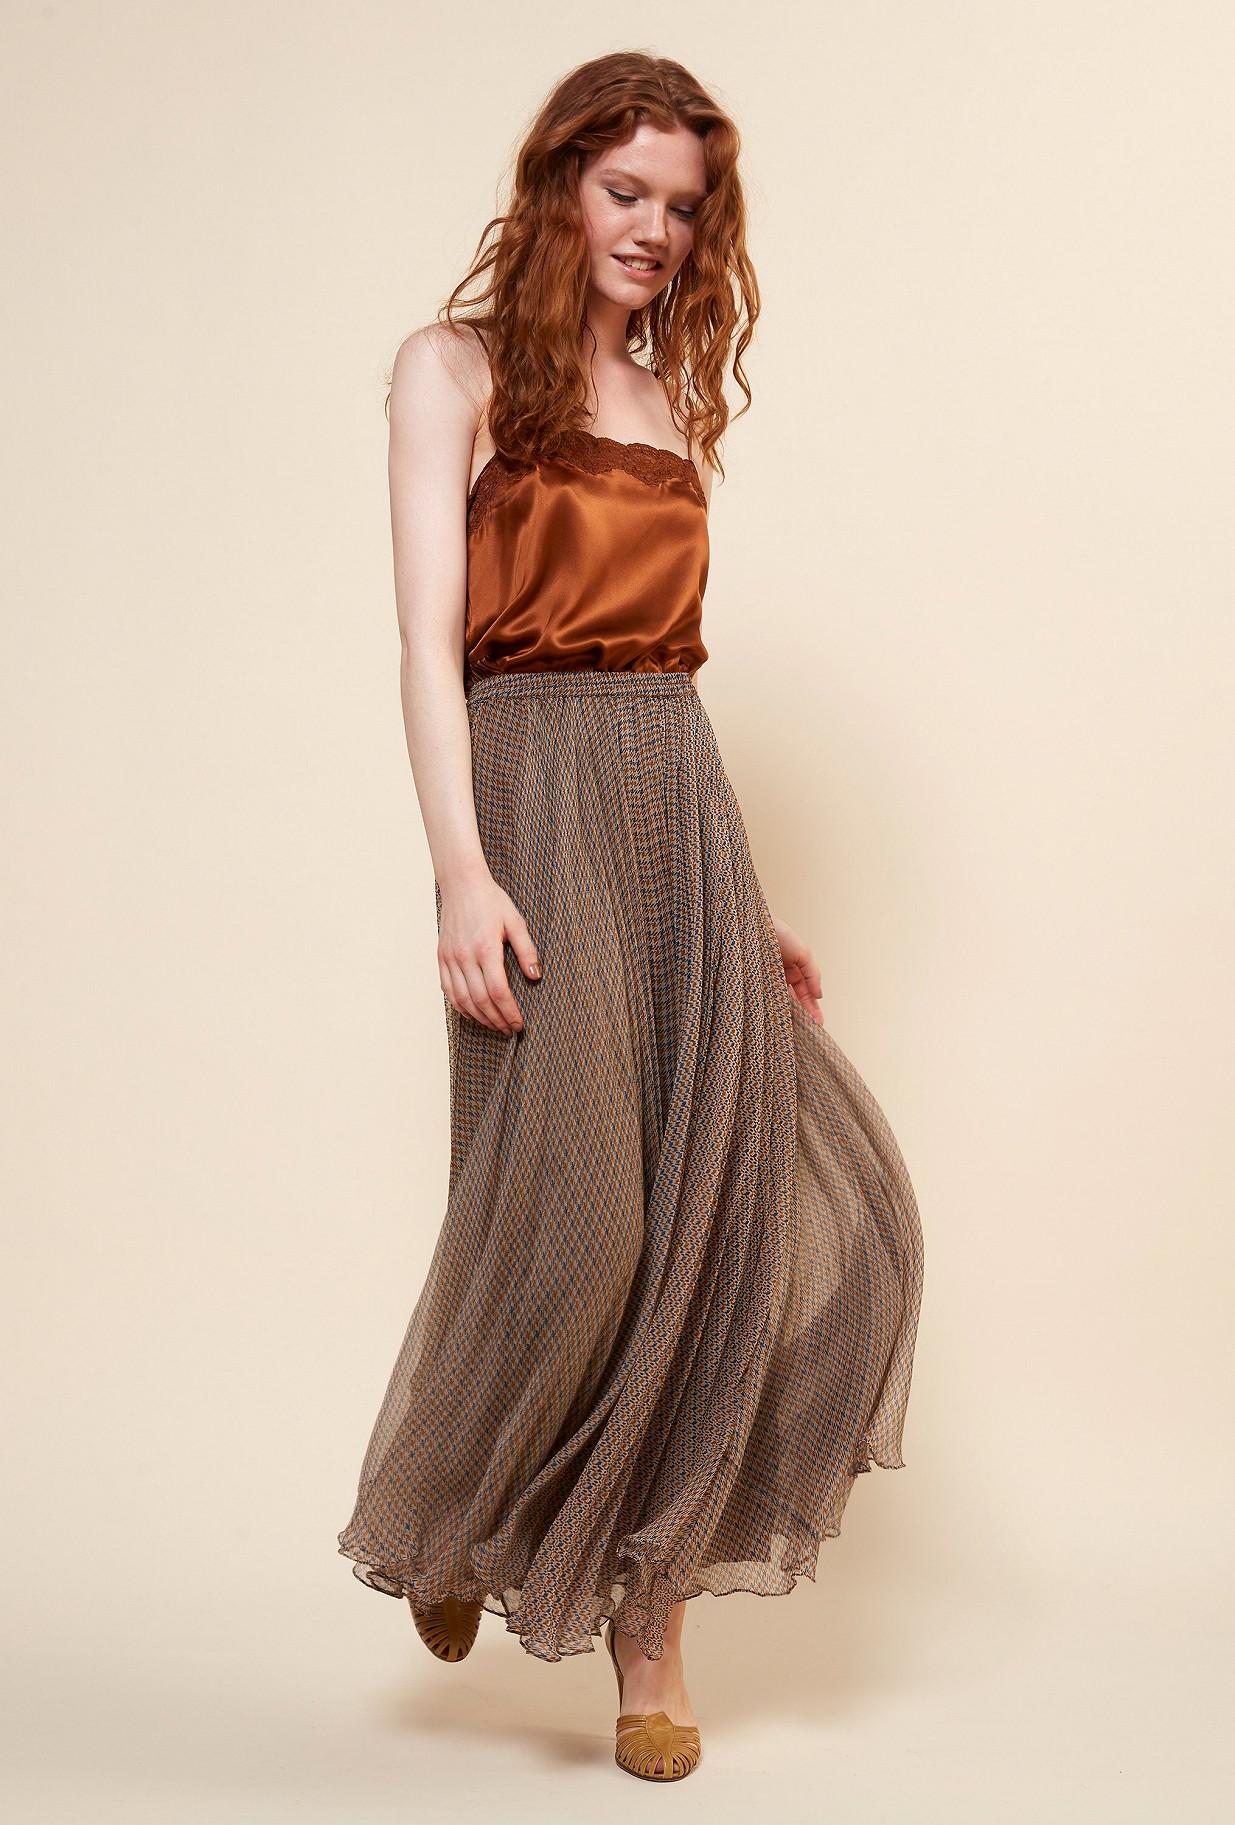 Natural  Skirt  Shirley Mes demoiselles fashion clothes designer Paris